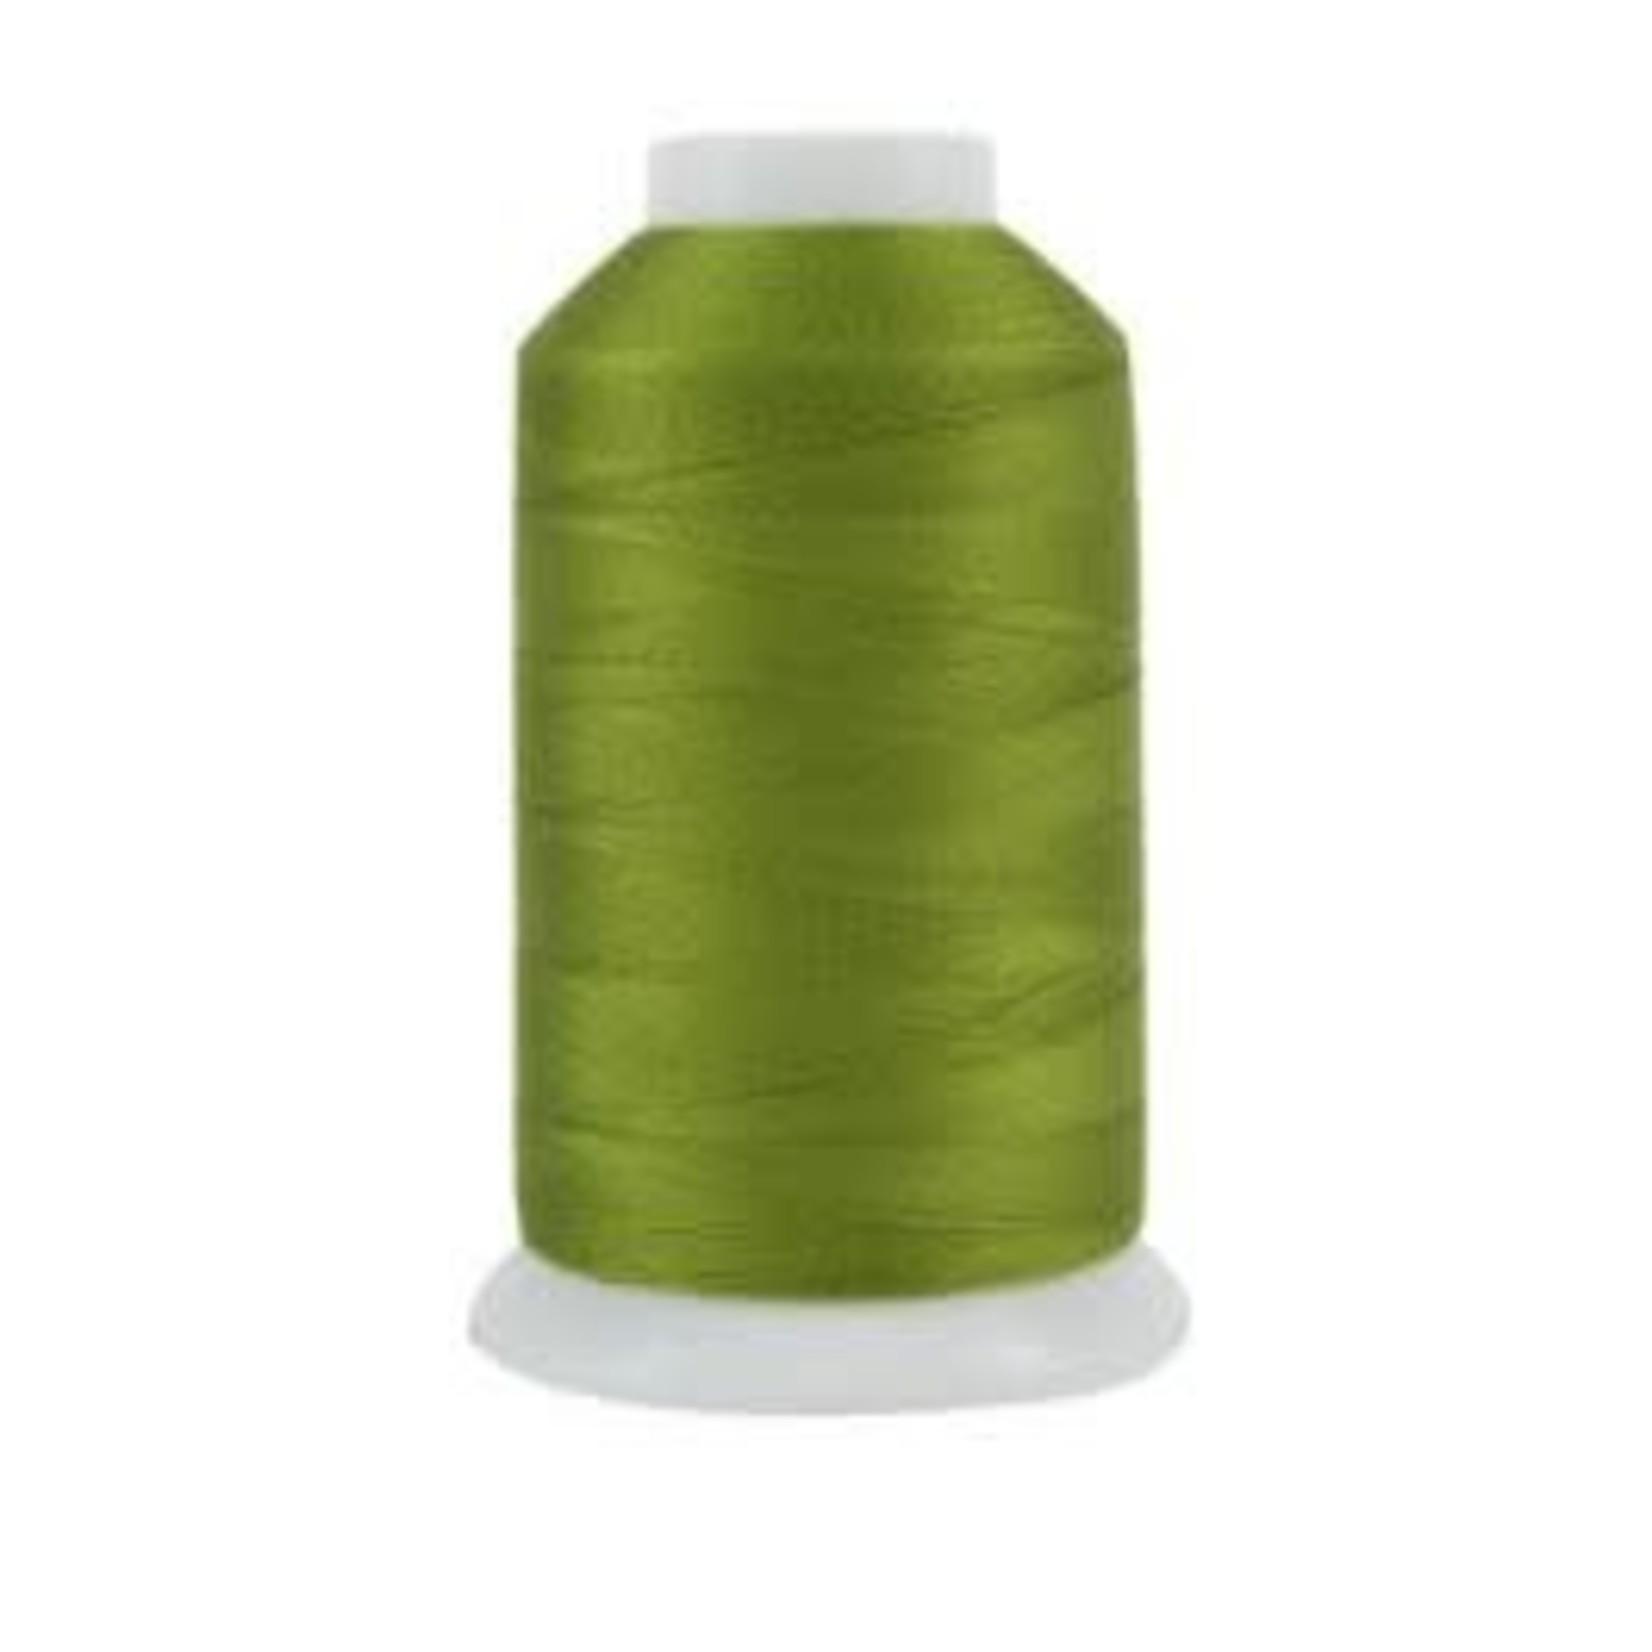 Superior Threads King Tut - #40 - 1828 m - 1009 Jalapeno